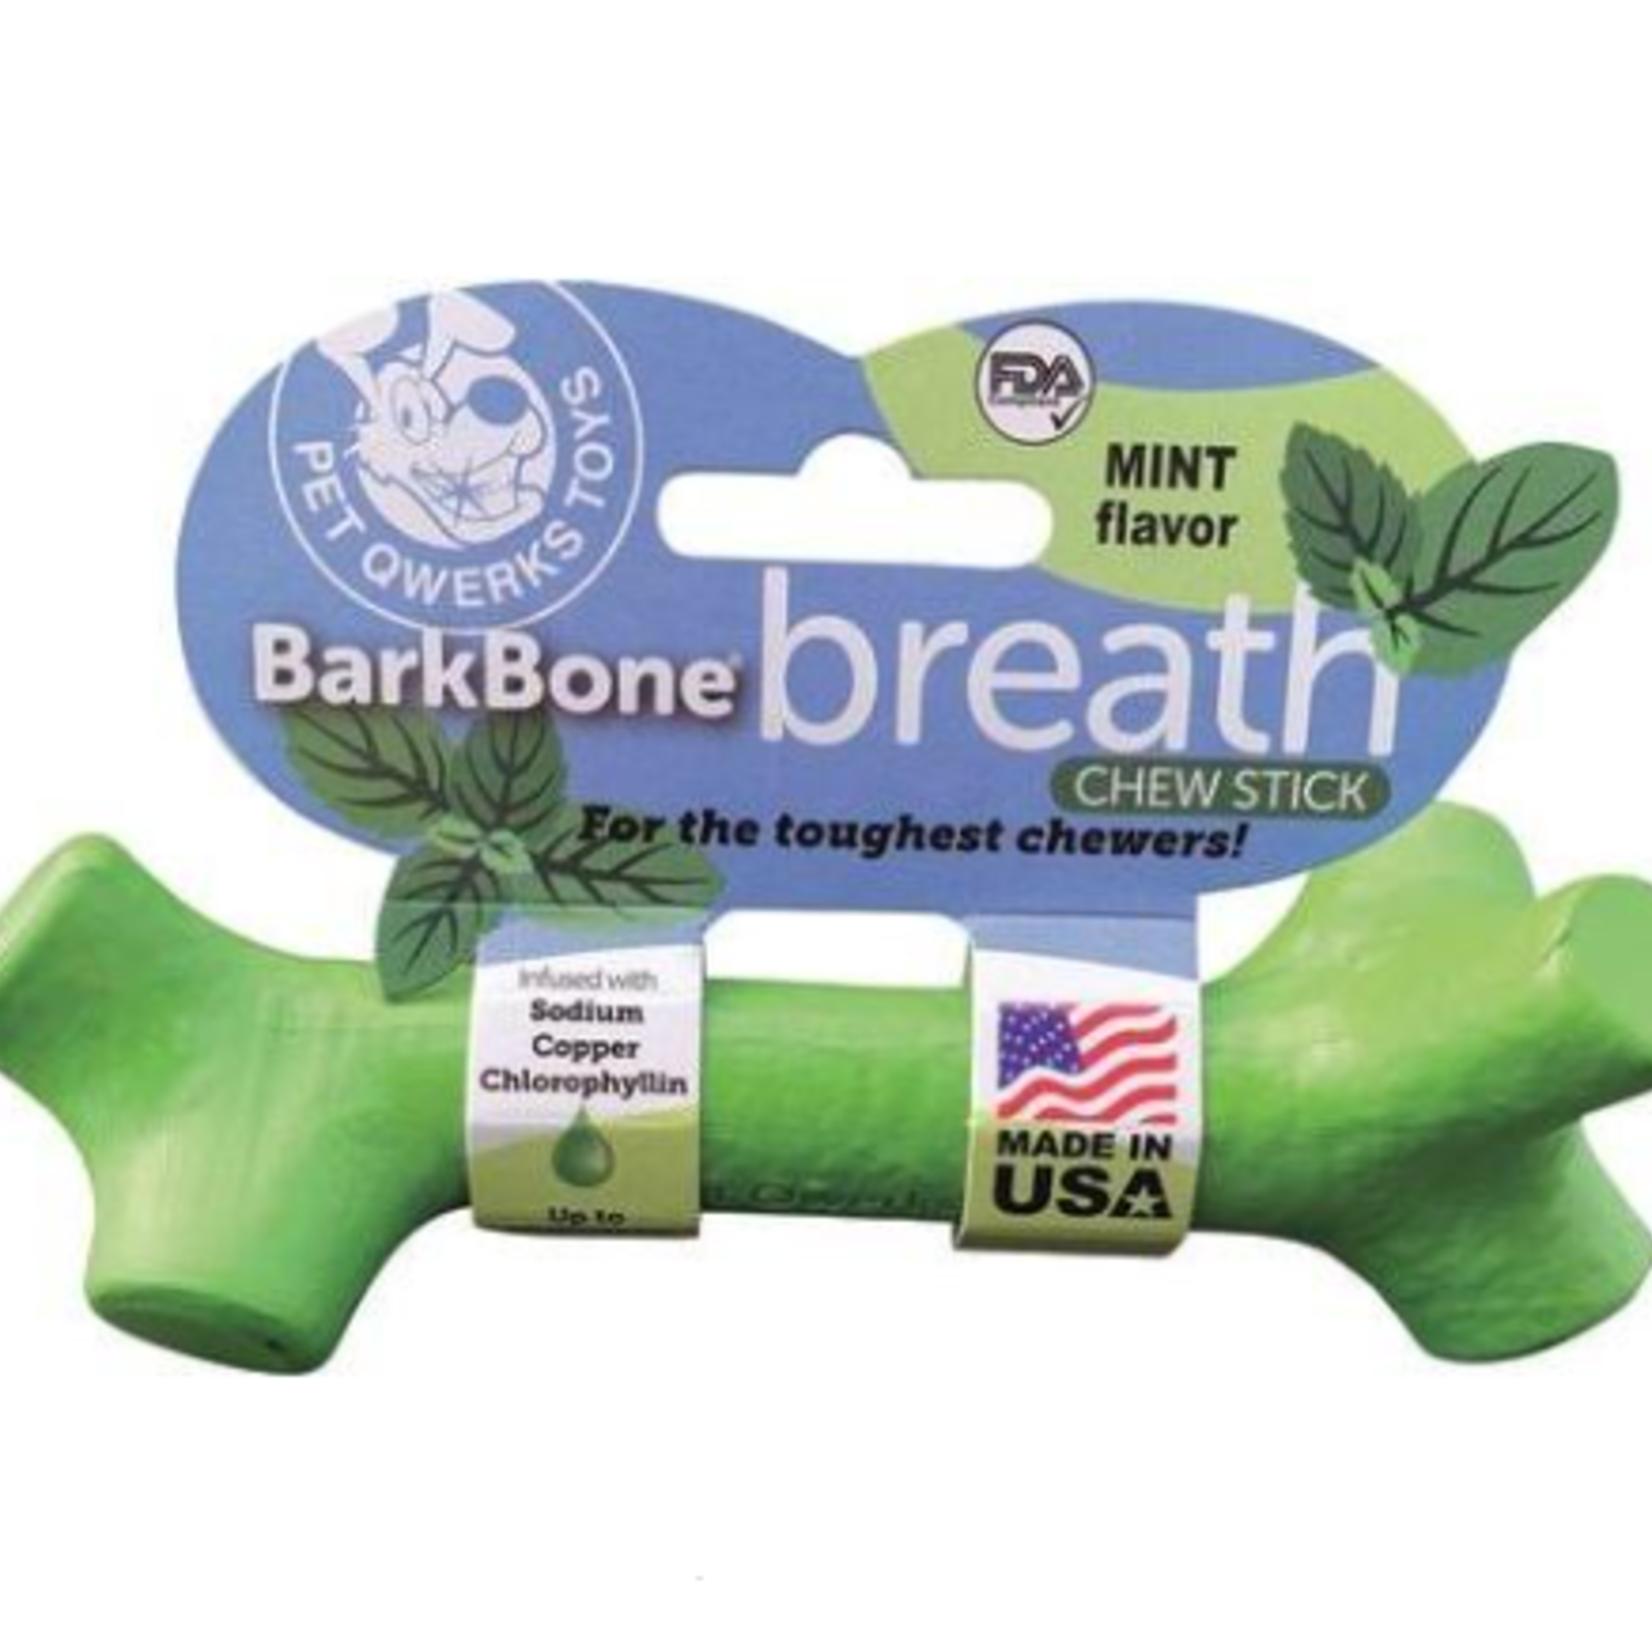 BarkBone Bark Bone - Mint